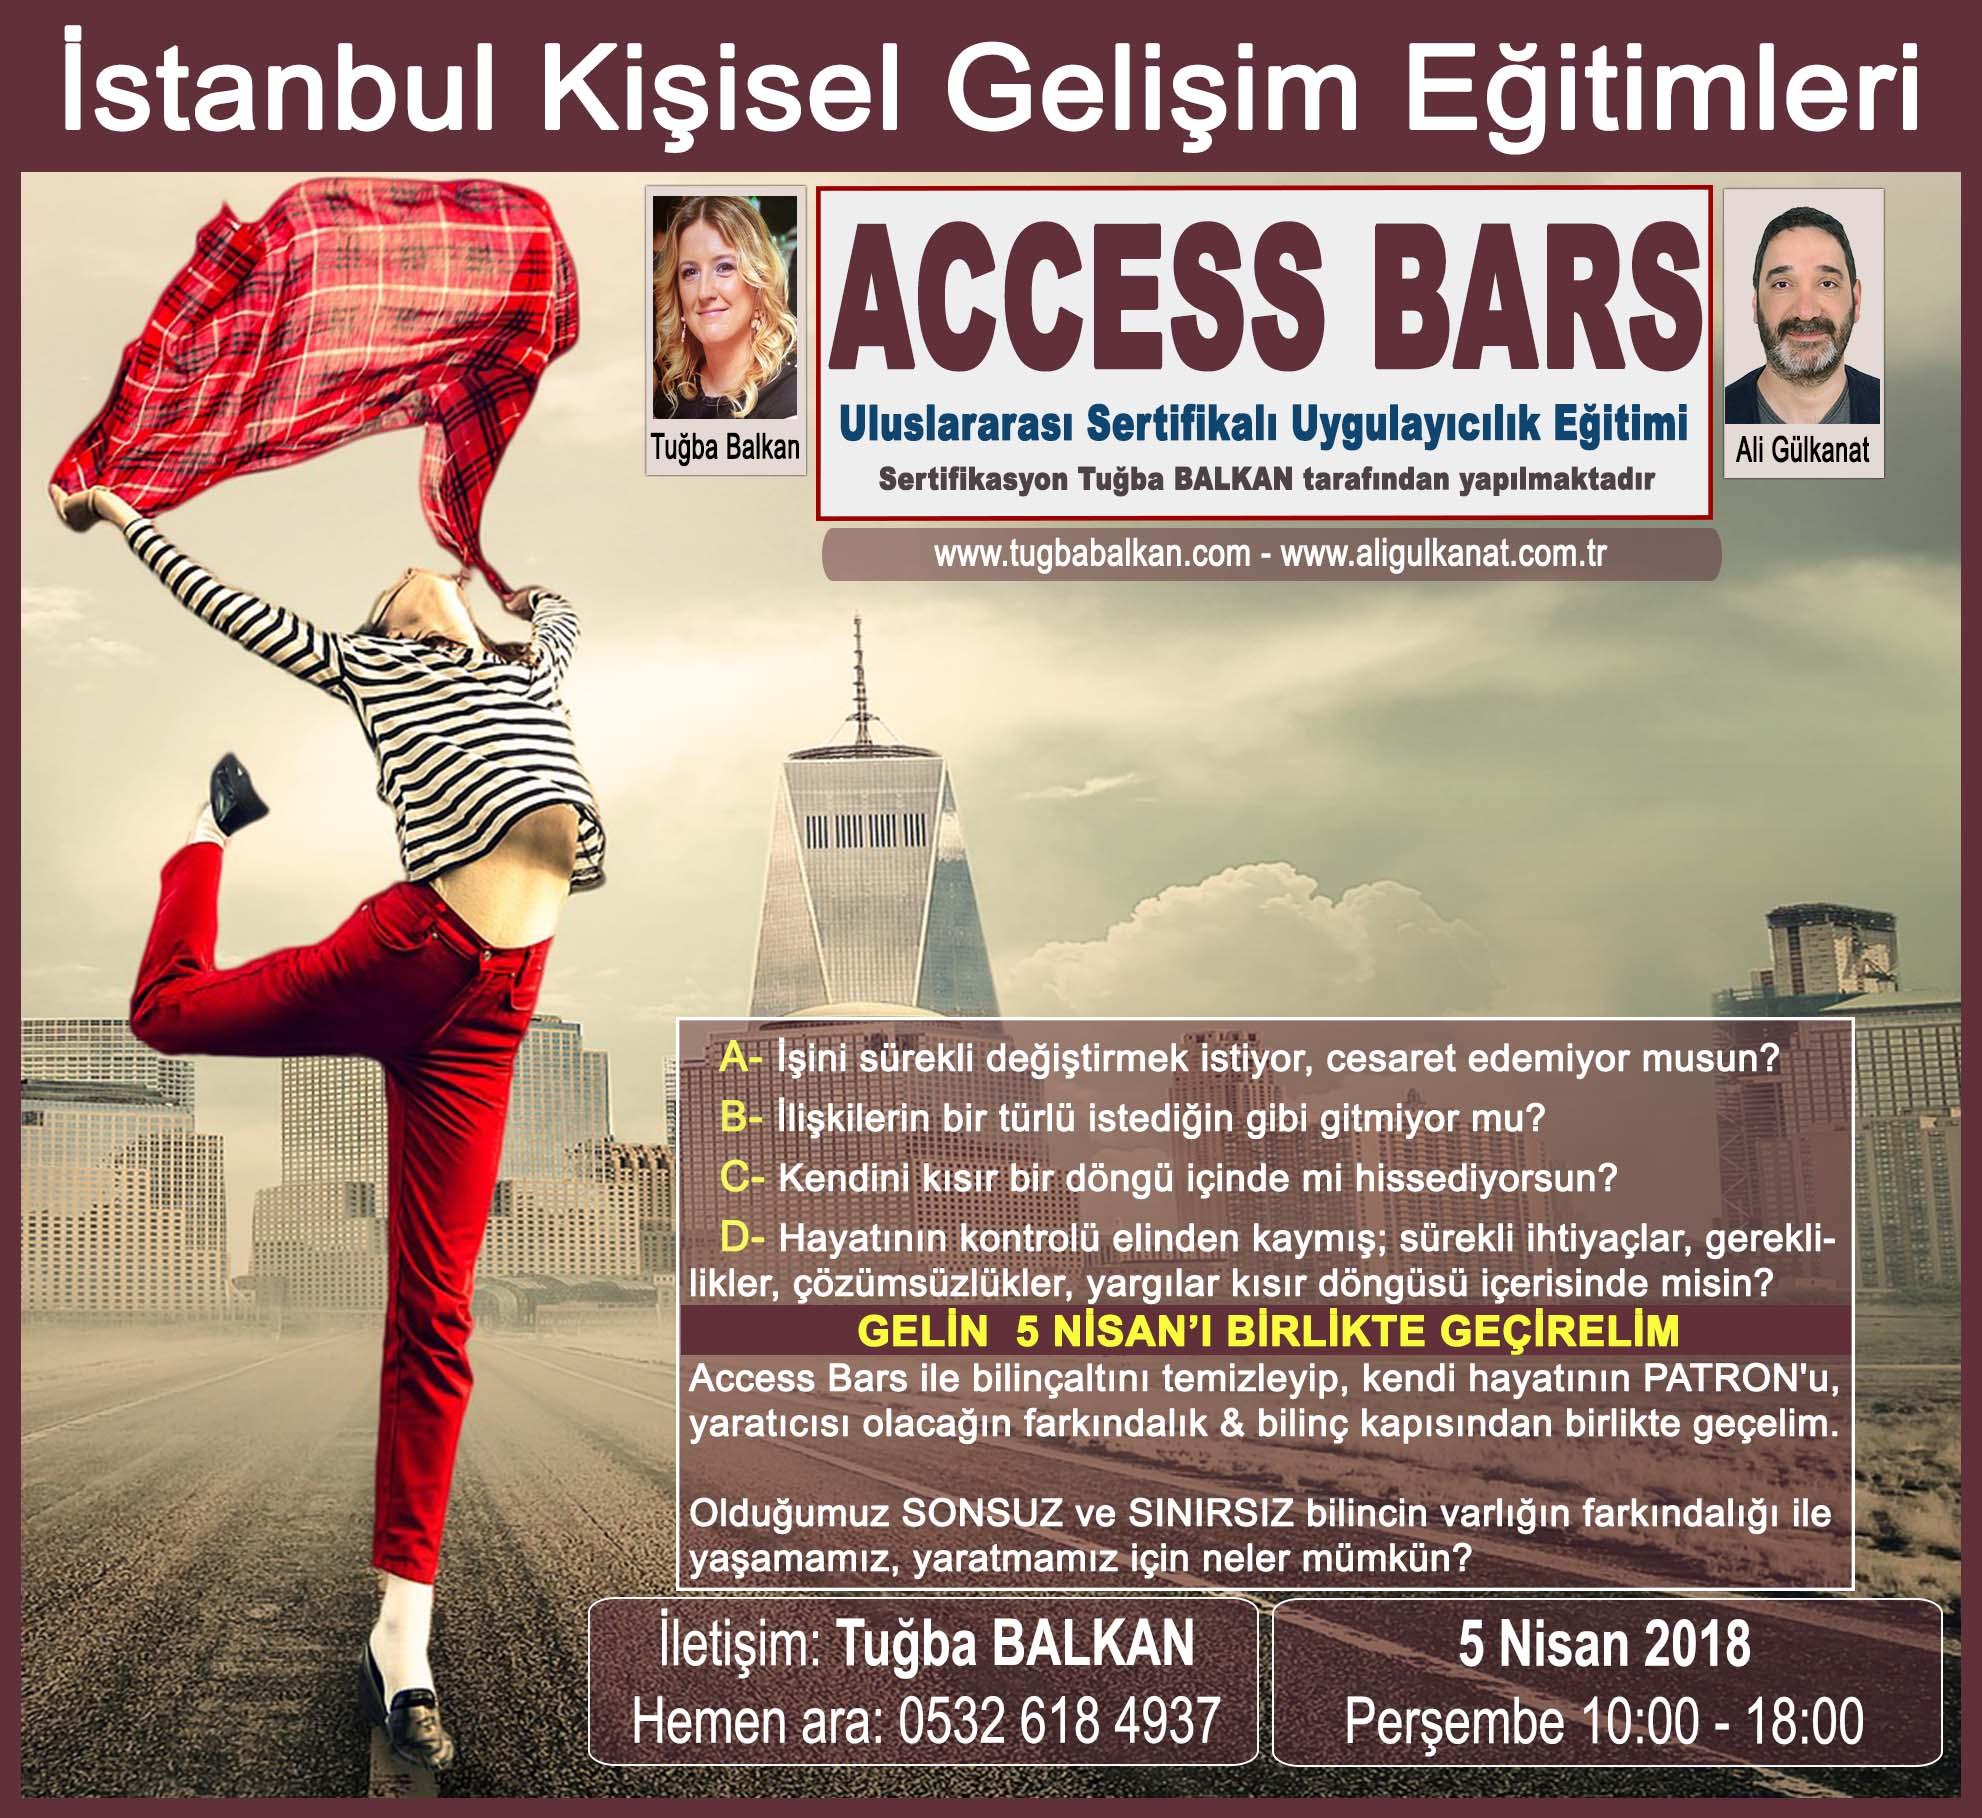 access-bars-tanitim-5-nisan-2018-1